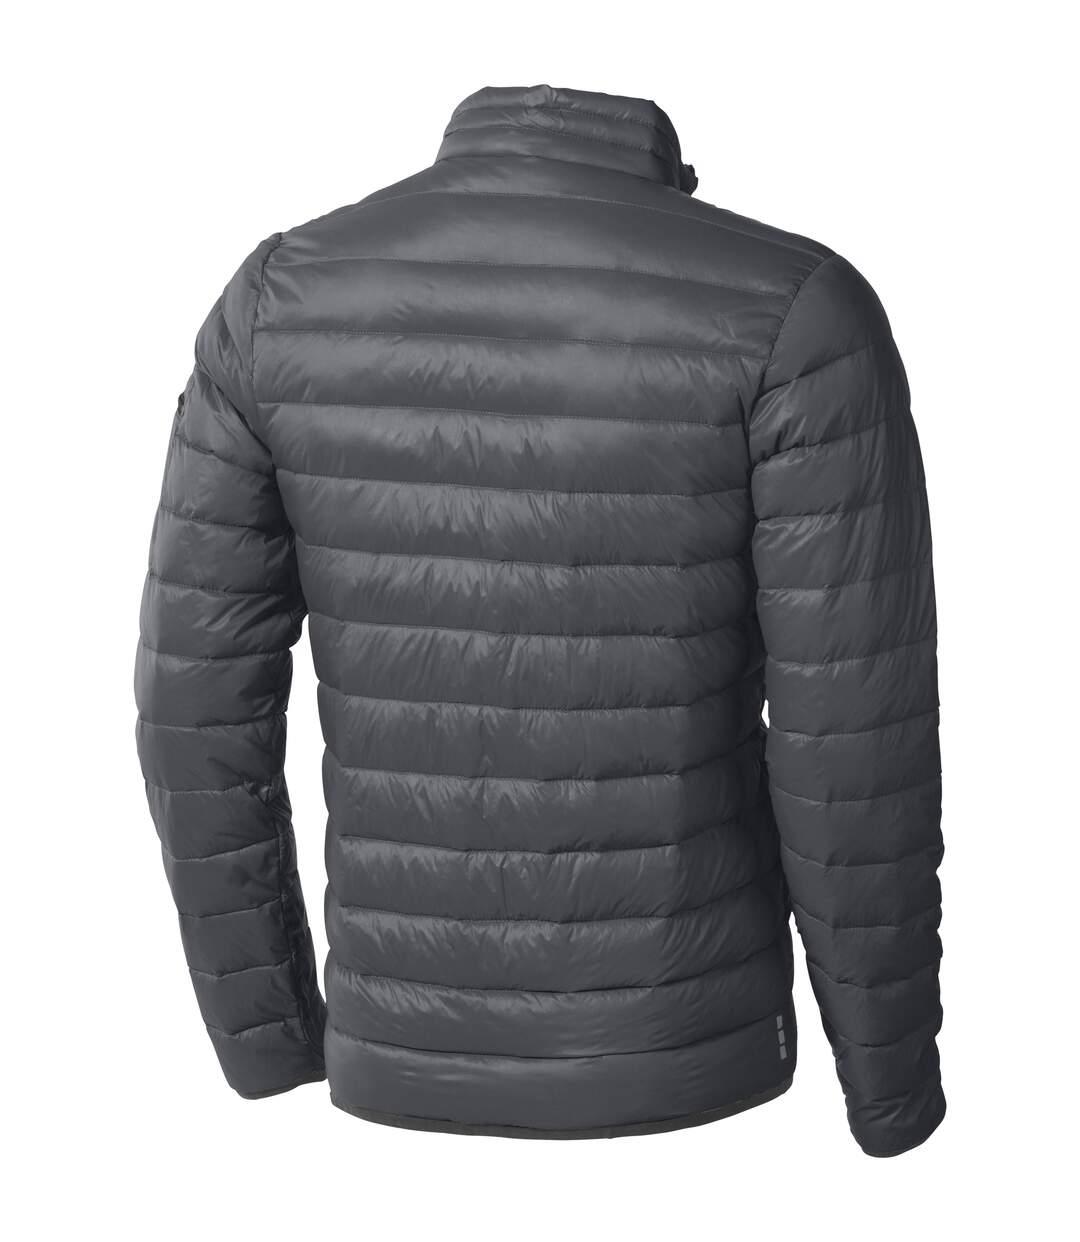 Elevate Mens Scotia Light Down Jacket (Steel Grey) - UTPF1901